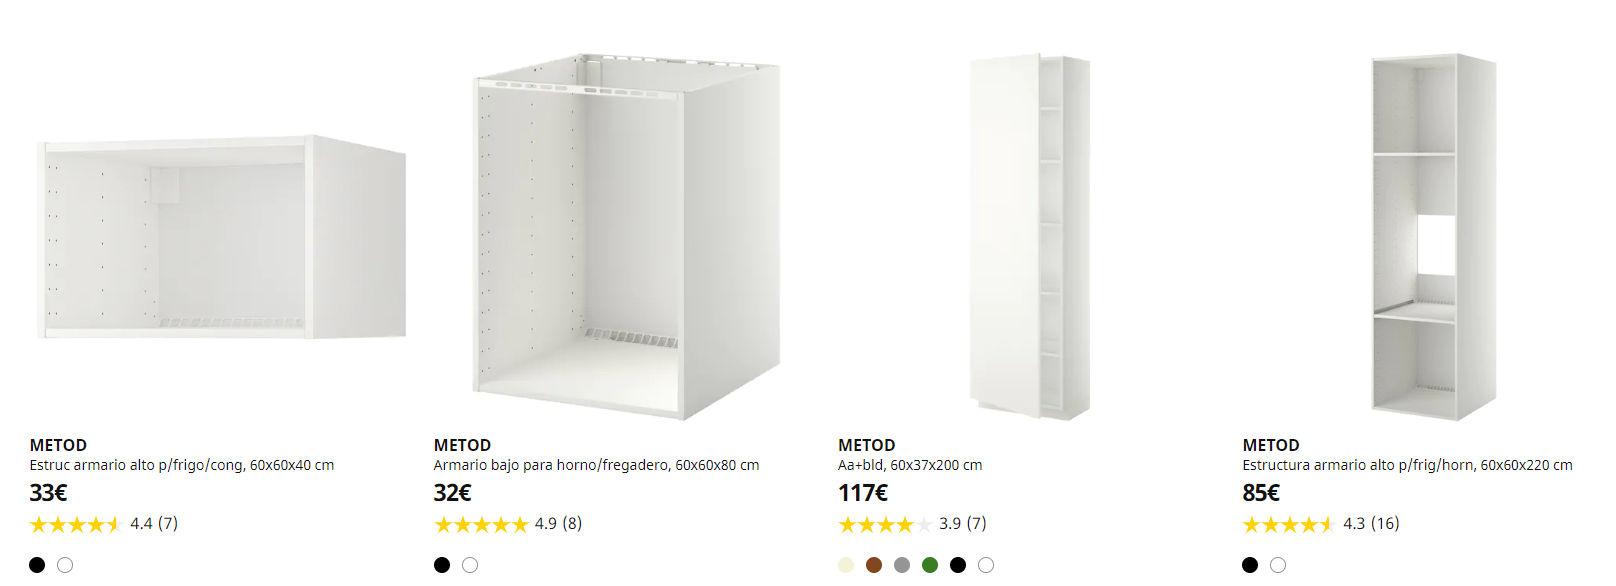 Muebles de cocina Metod IKEA